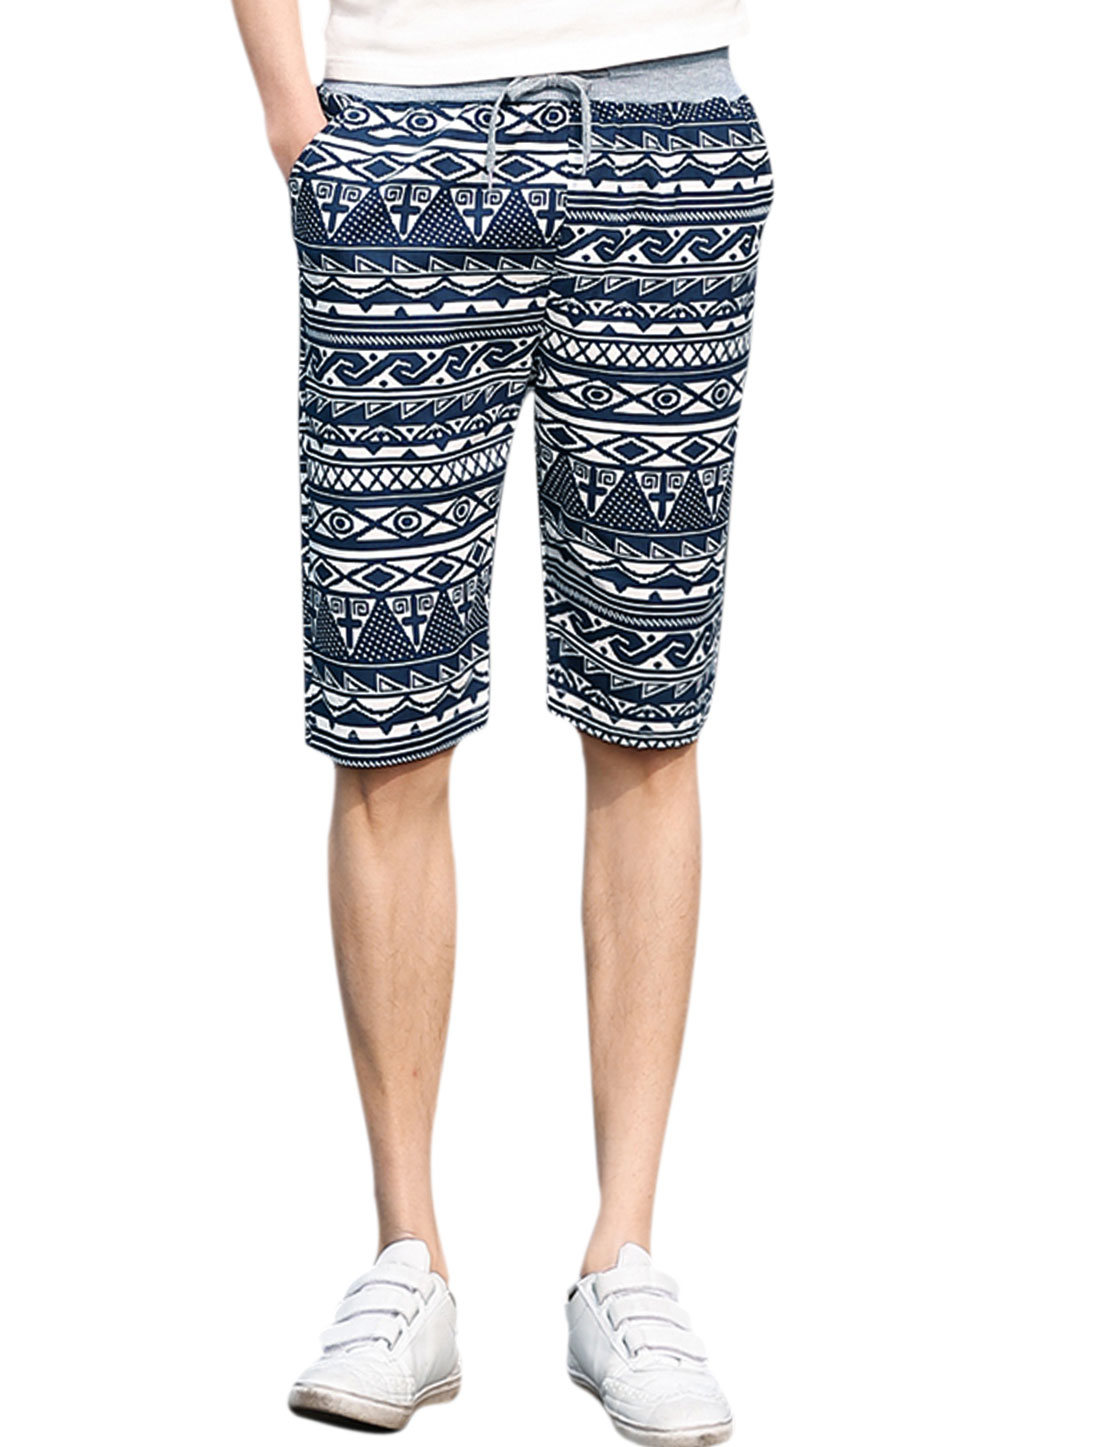 Man Geometrical Prints Elastic Waist Slant Pockets Beach Shorts Navy Blue White W32